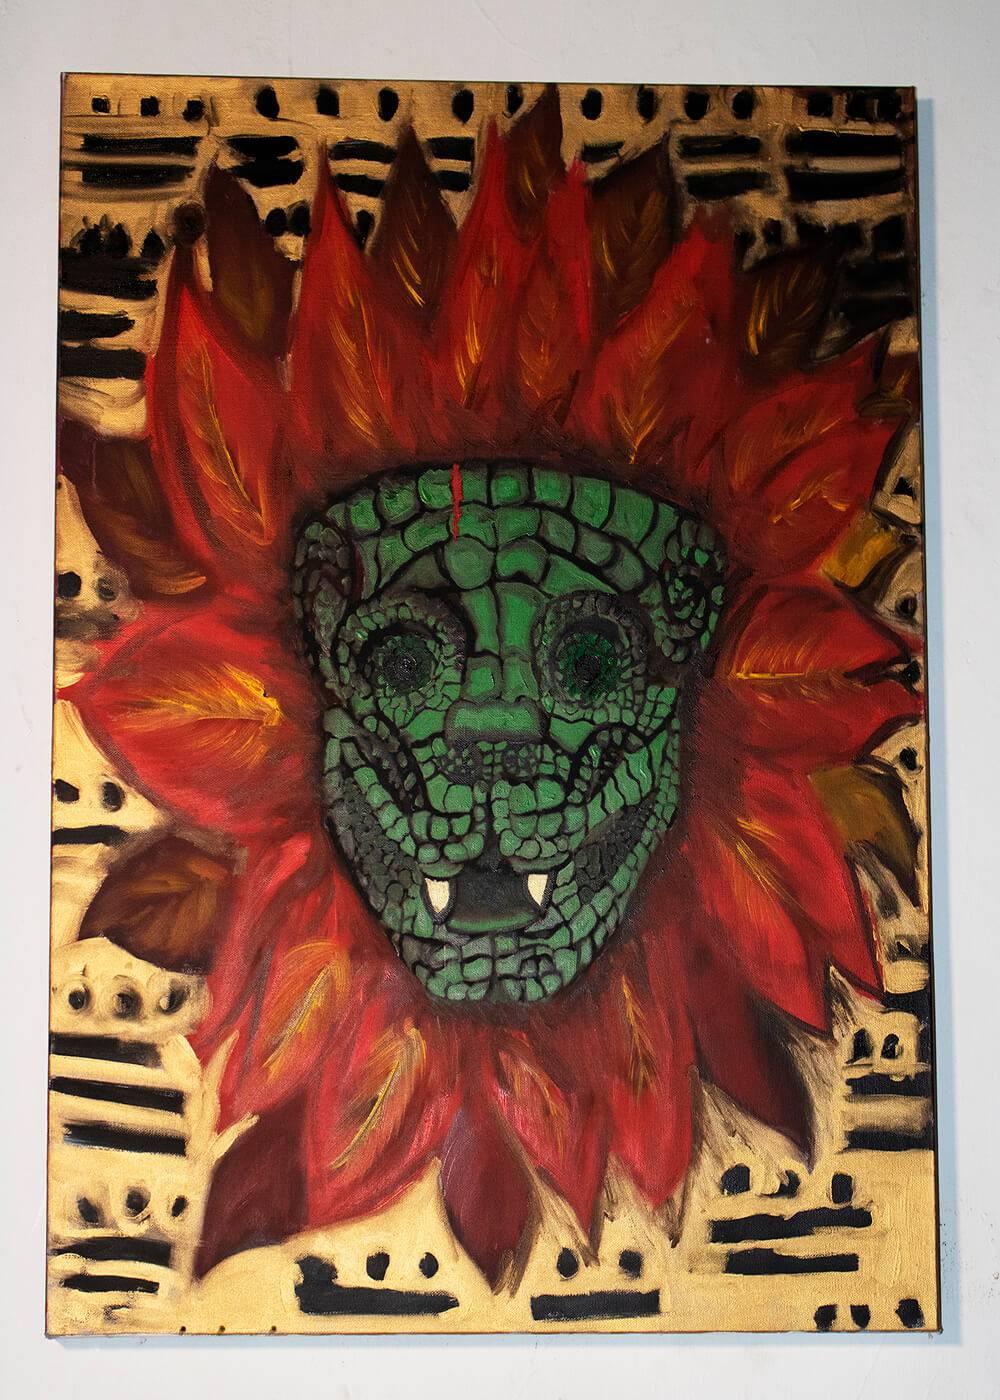 Image of Quetzalcoatl on panel.